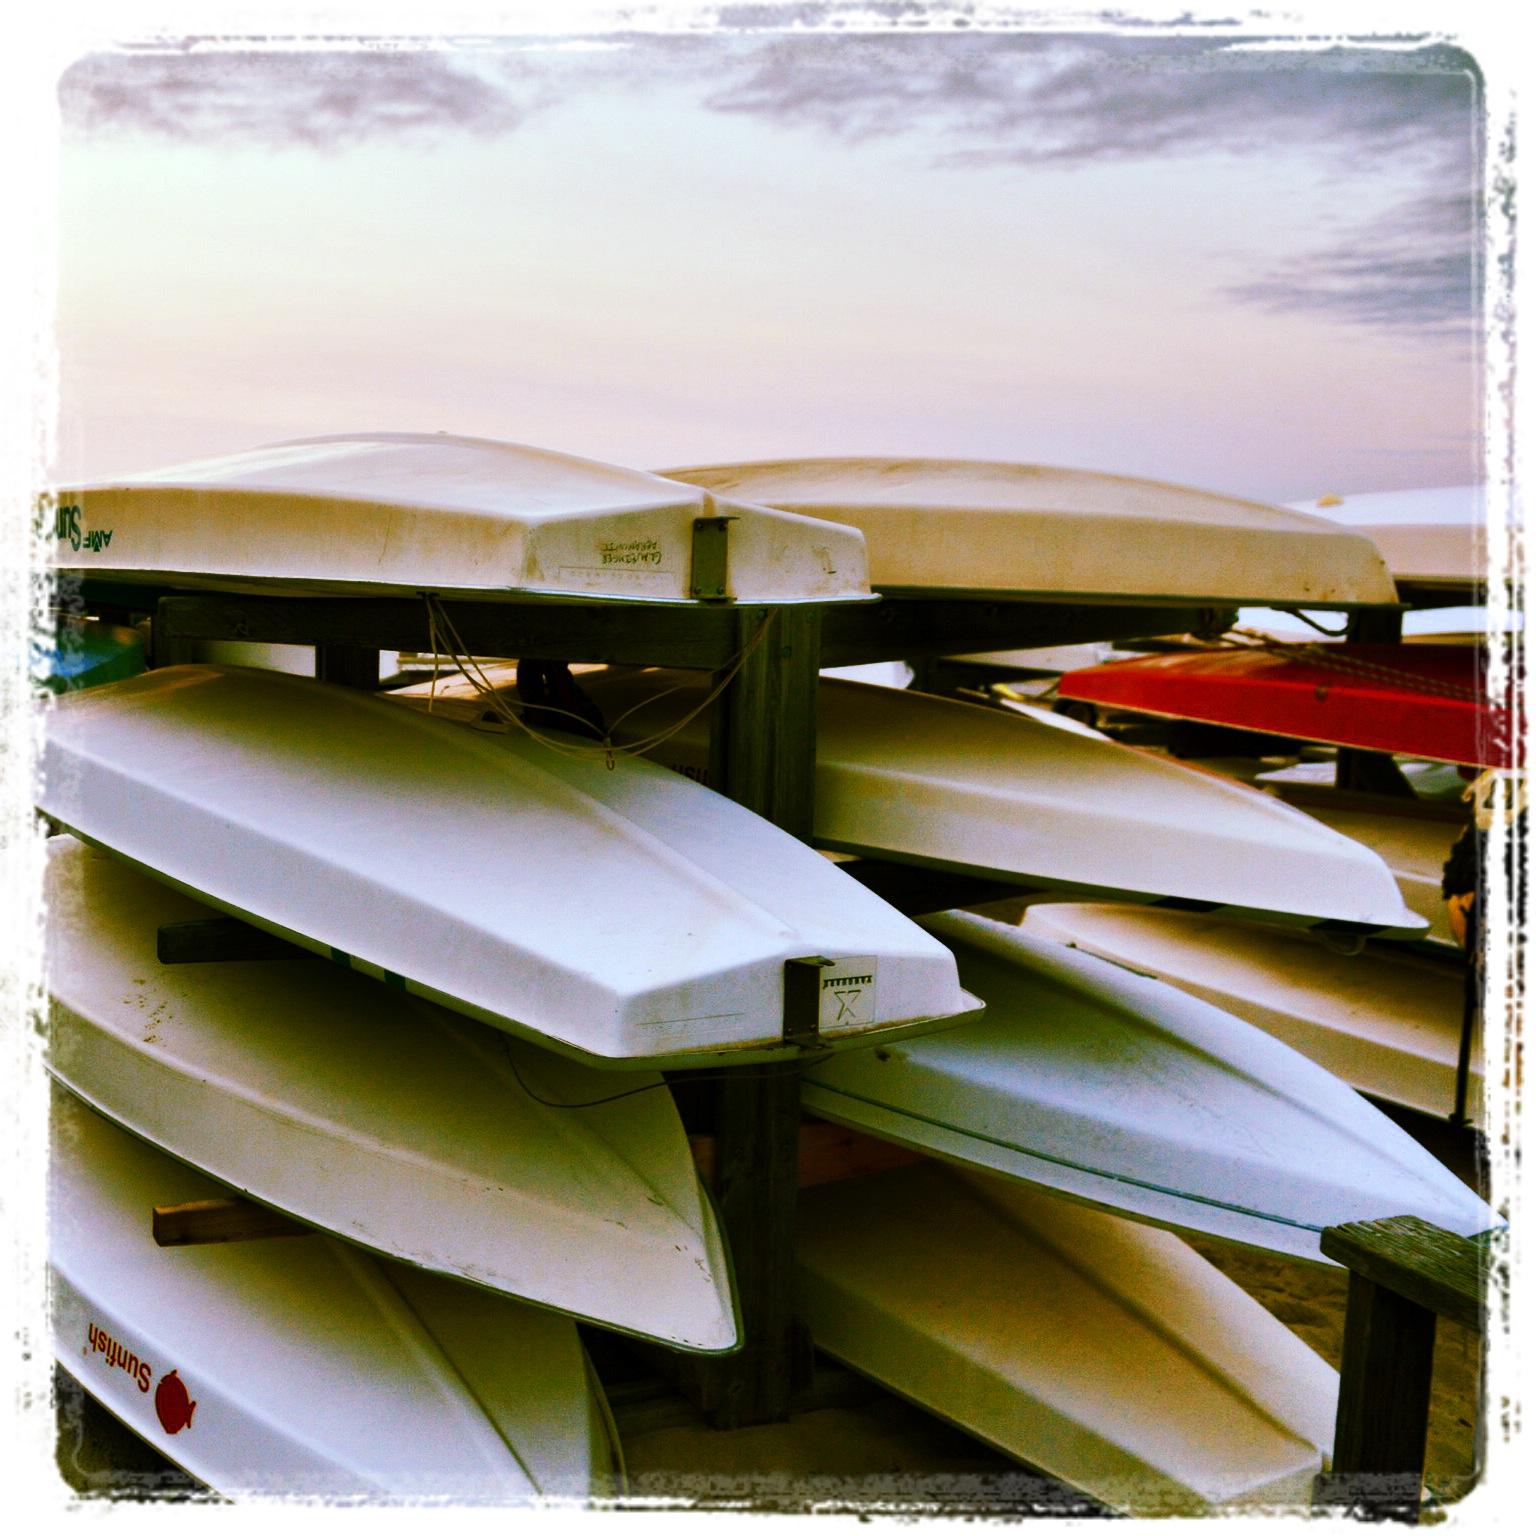 Sailboats Racks at the DYC